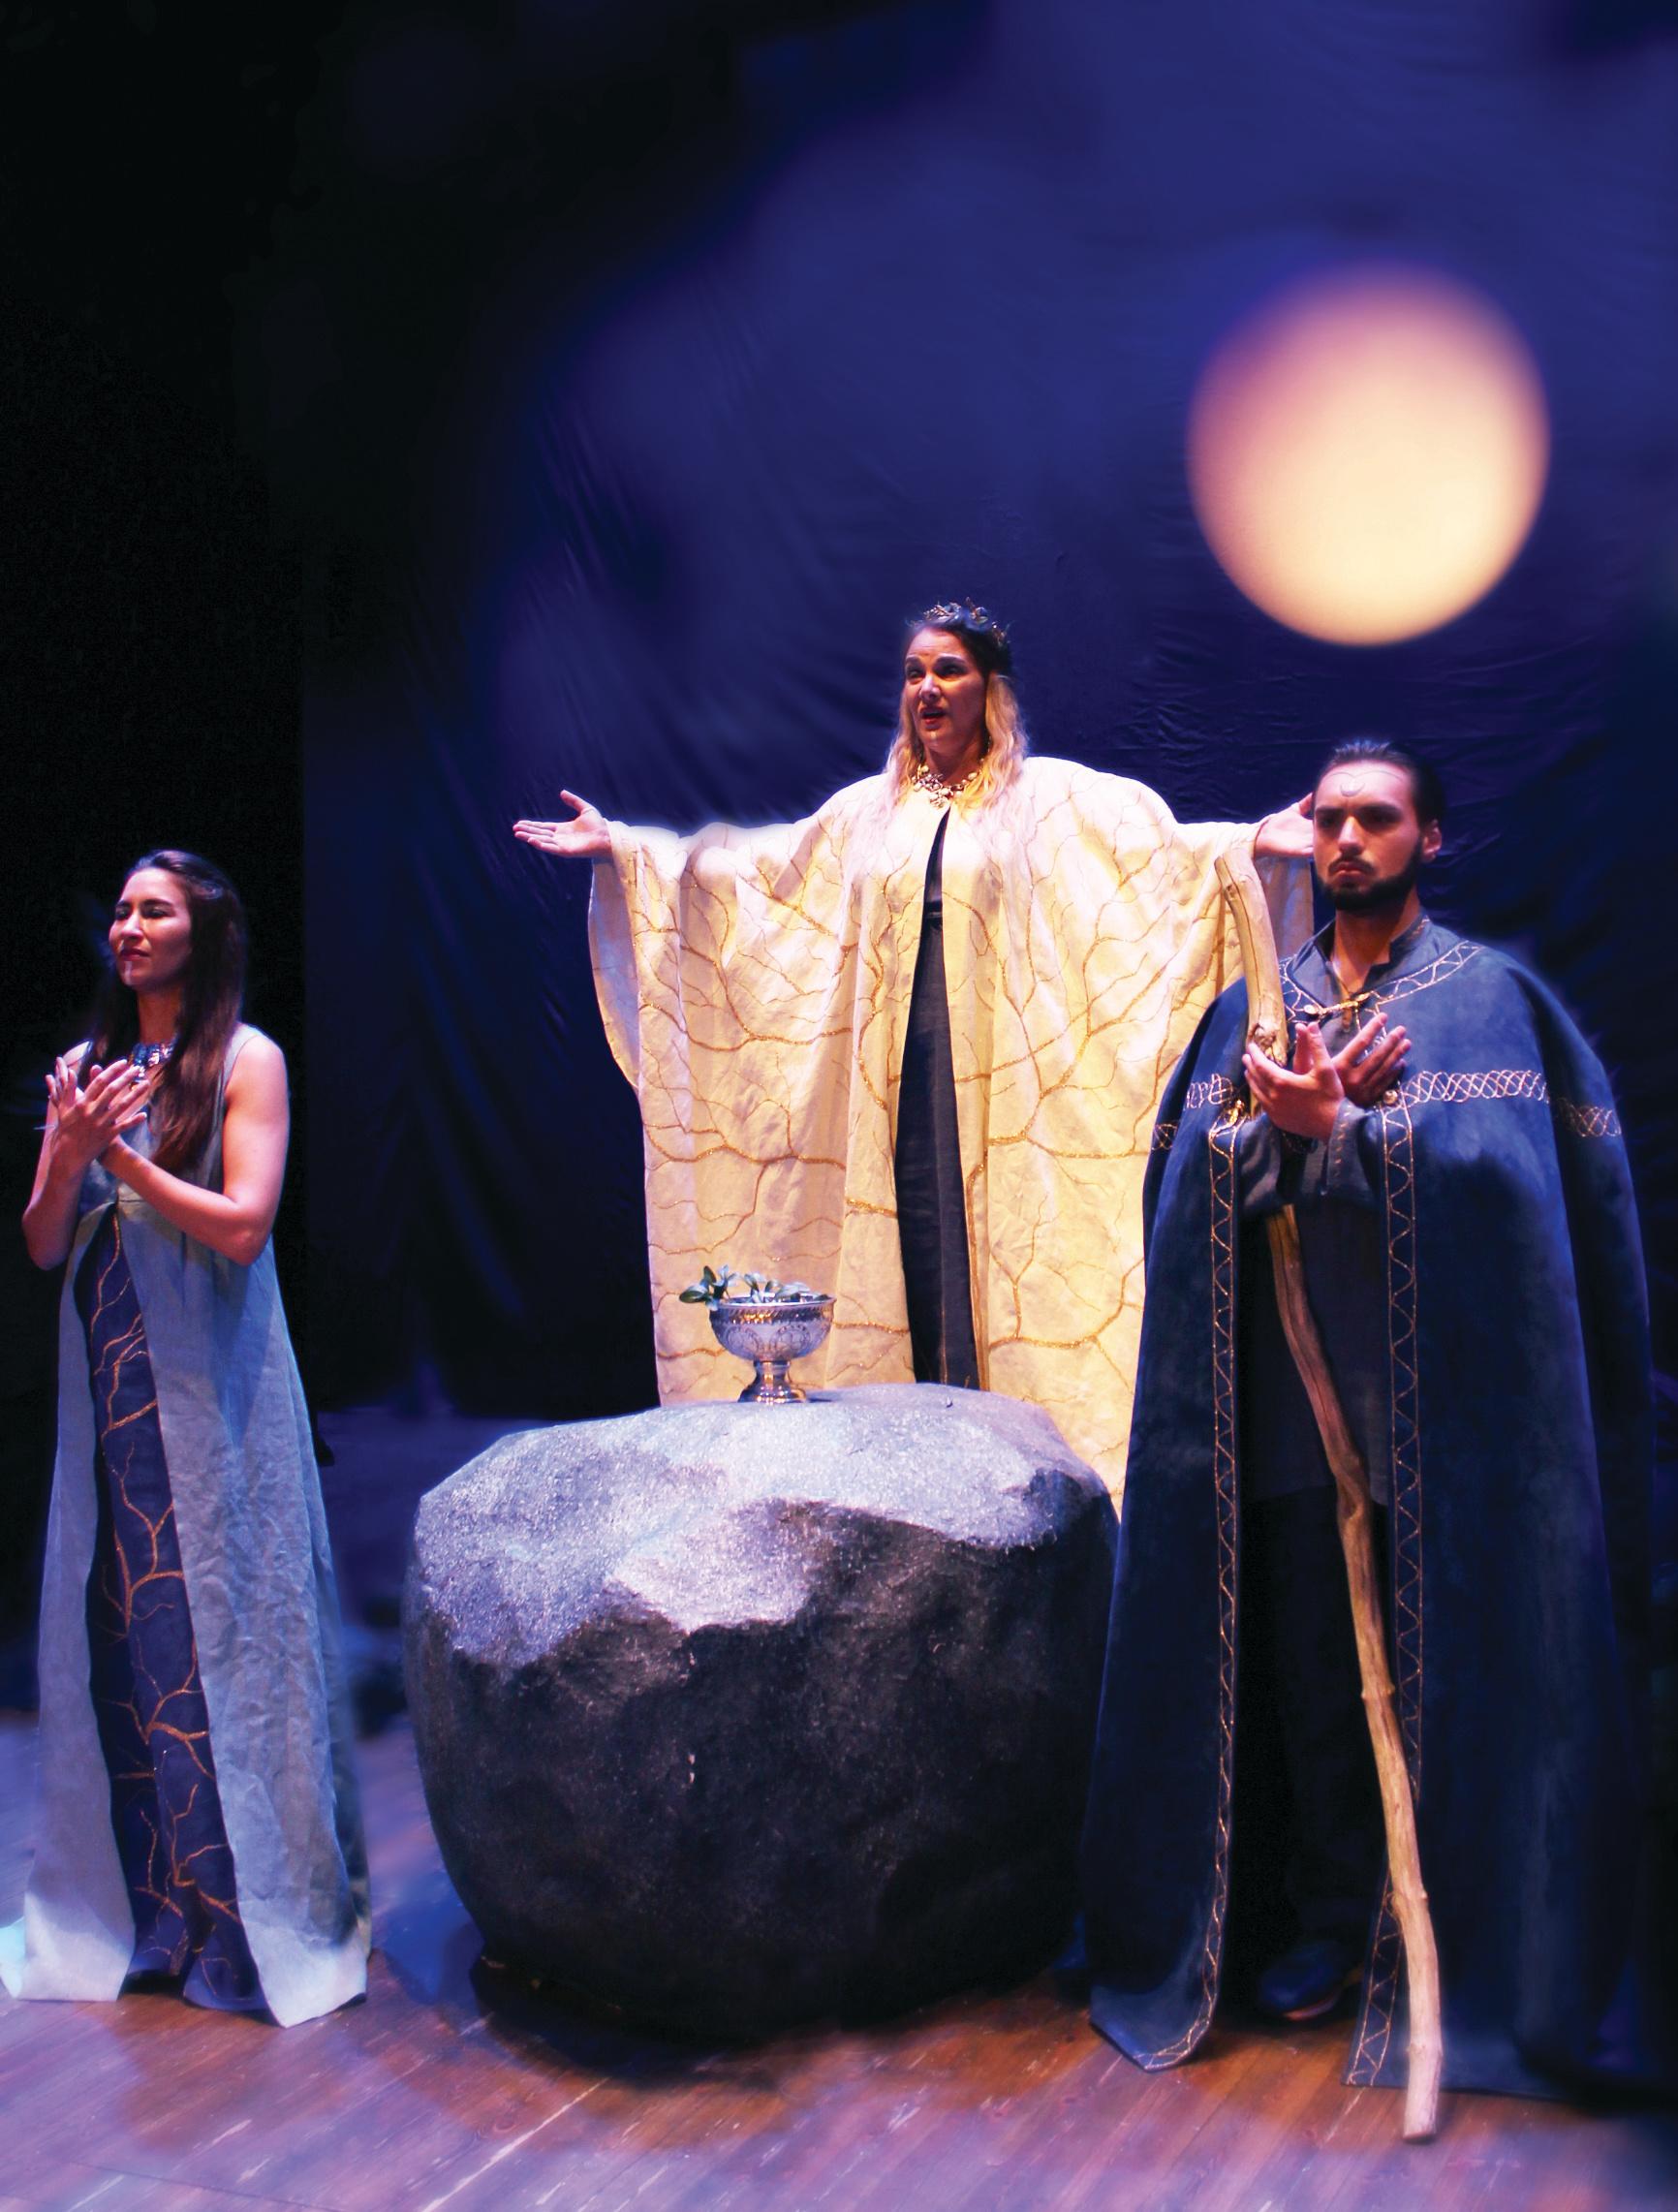 Norma_Oroveso_Adalgisa_Norma_Operafabriken2018